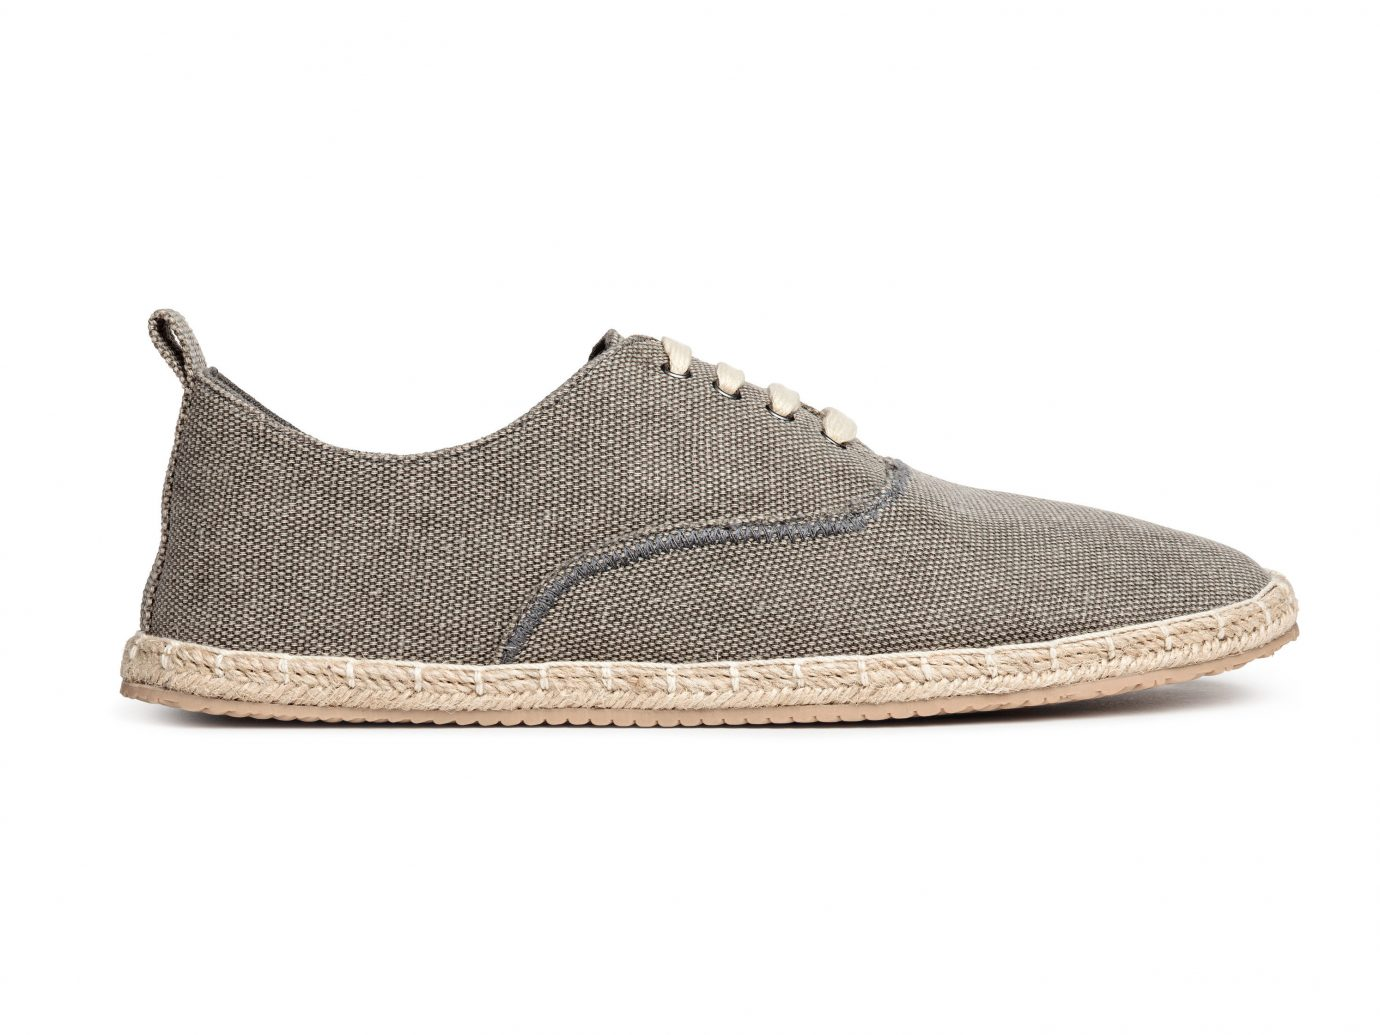 14361f40a2 Style + Design footwear shoe product leather running shoe beige outdoor shoe  sneakers